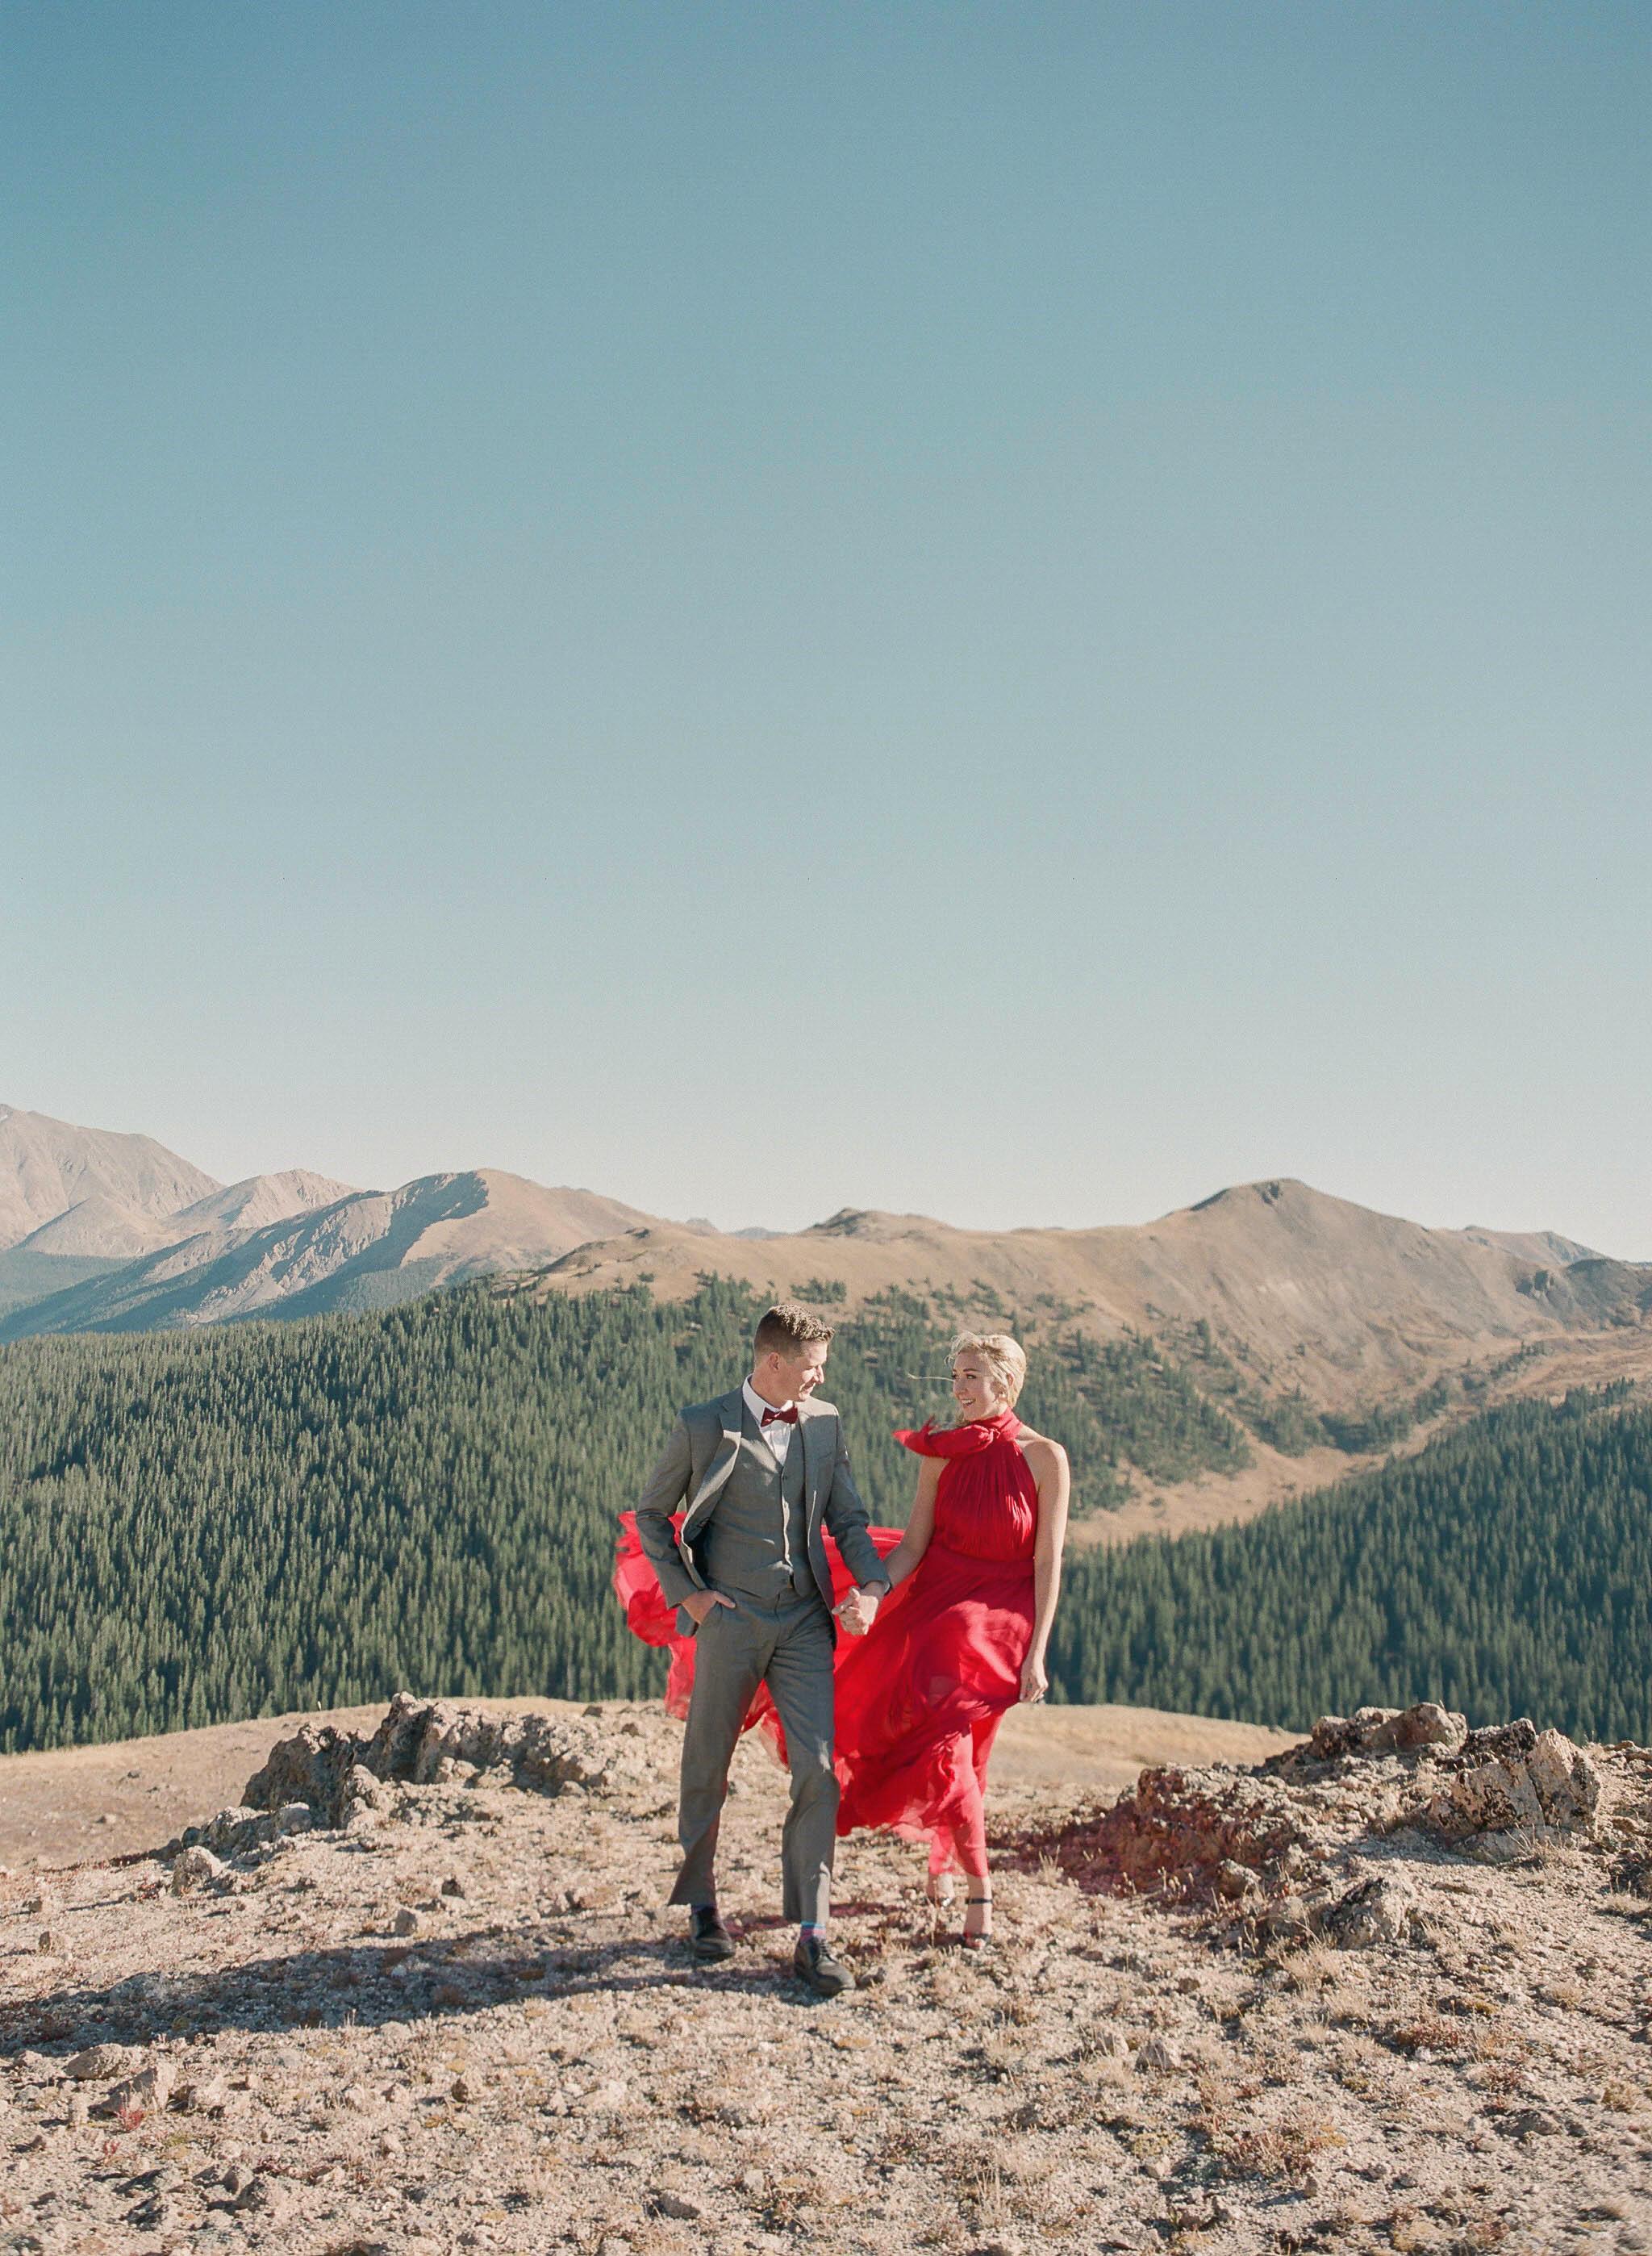 destination engagement couple mountain hike sunday attire